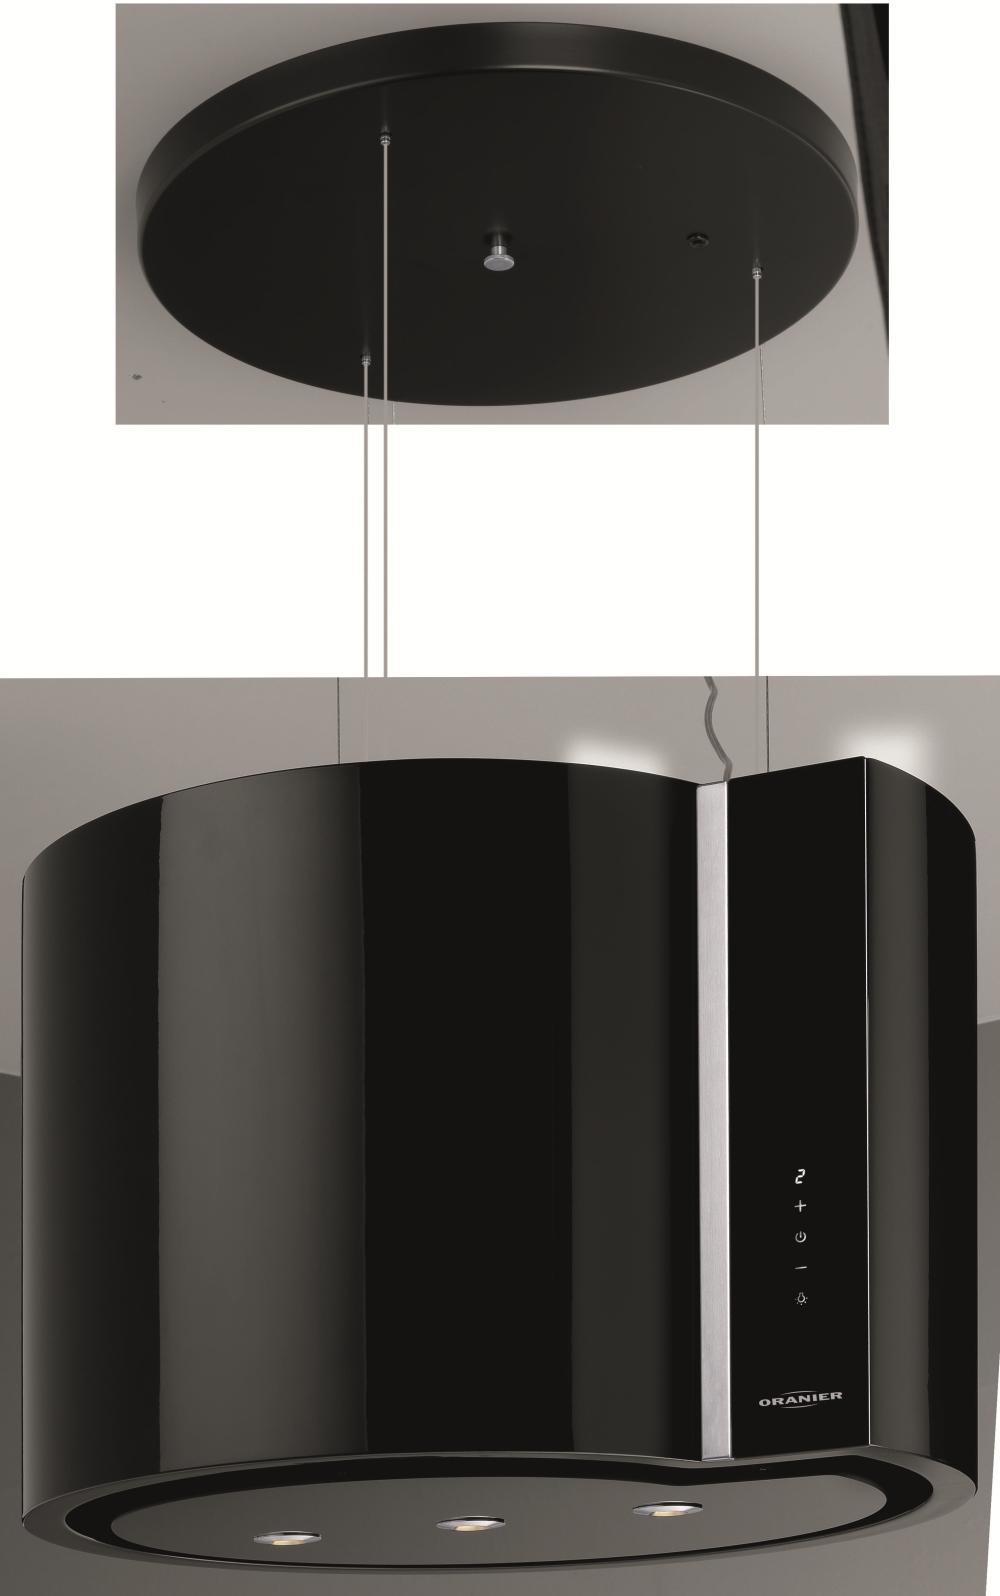 Oranier LindiaIsola 60 S 8789 25 Insel-Dunstabzugshaube/ Energieeffizienzklasse B